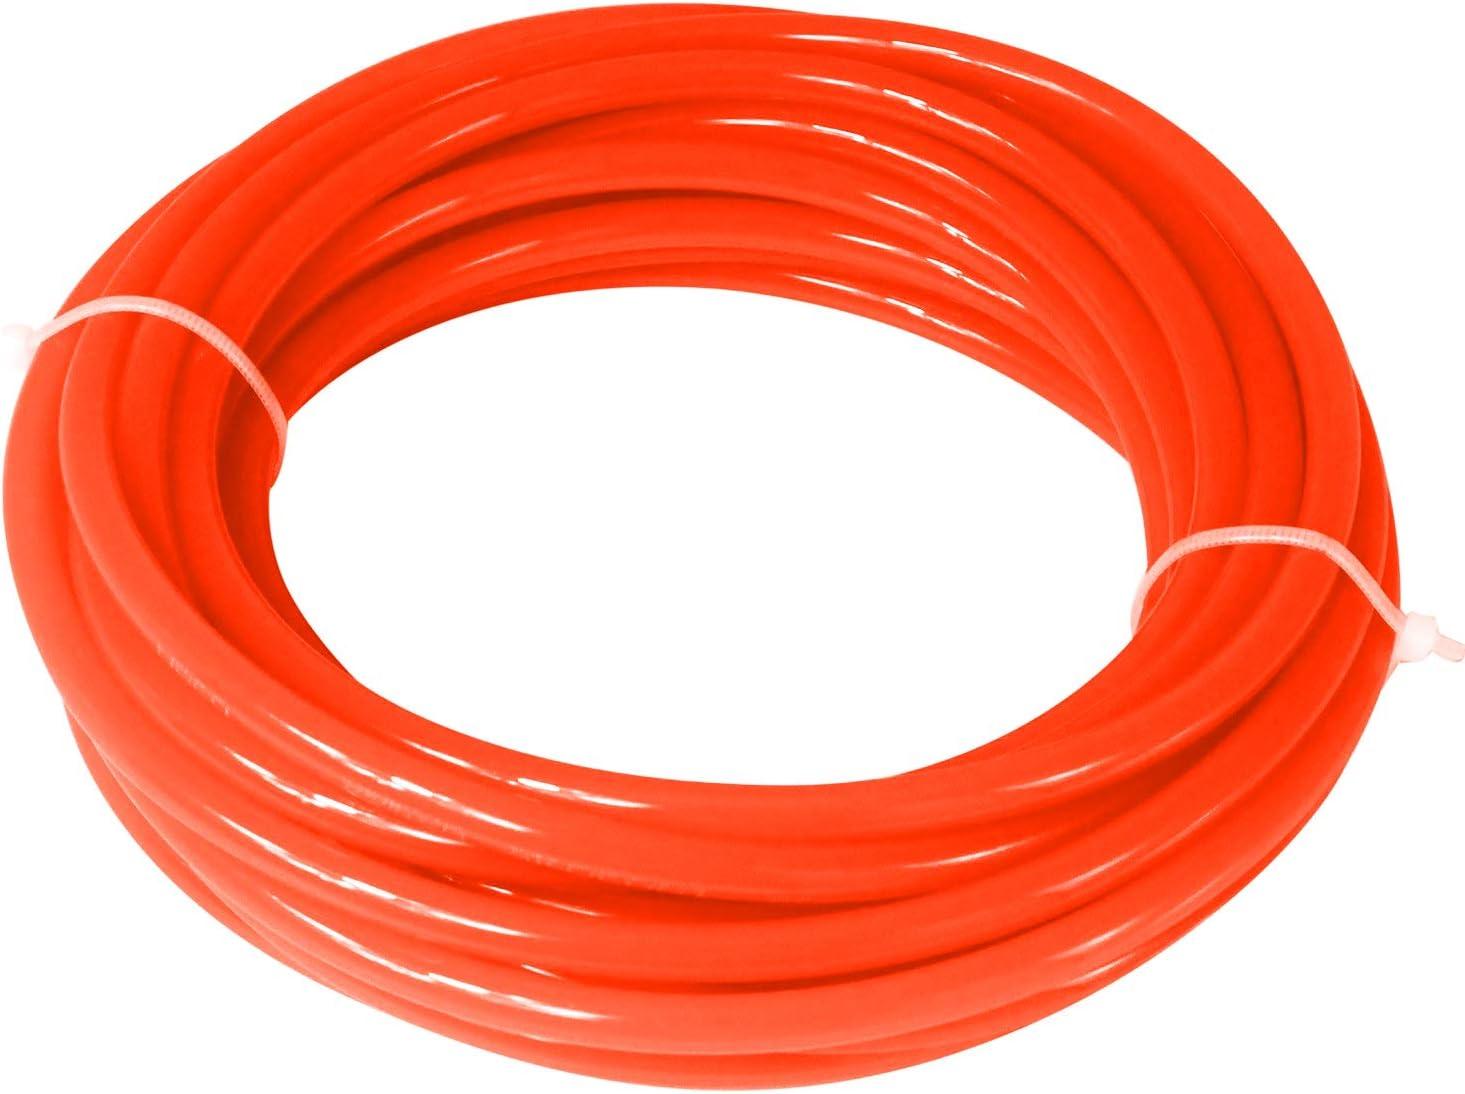 Blue 32.8ft Quickun Pneumatic Tubing 6mm x 4mm PU Polyurethane Tube Air Hose Line for Air Compressor Fitting or Fluid Transfer